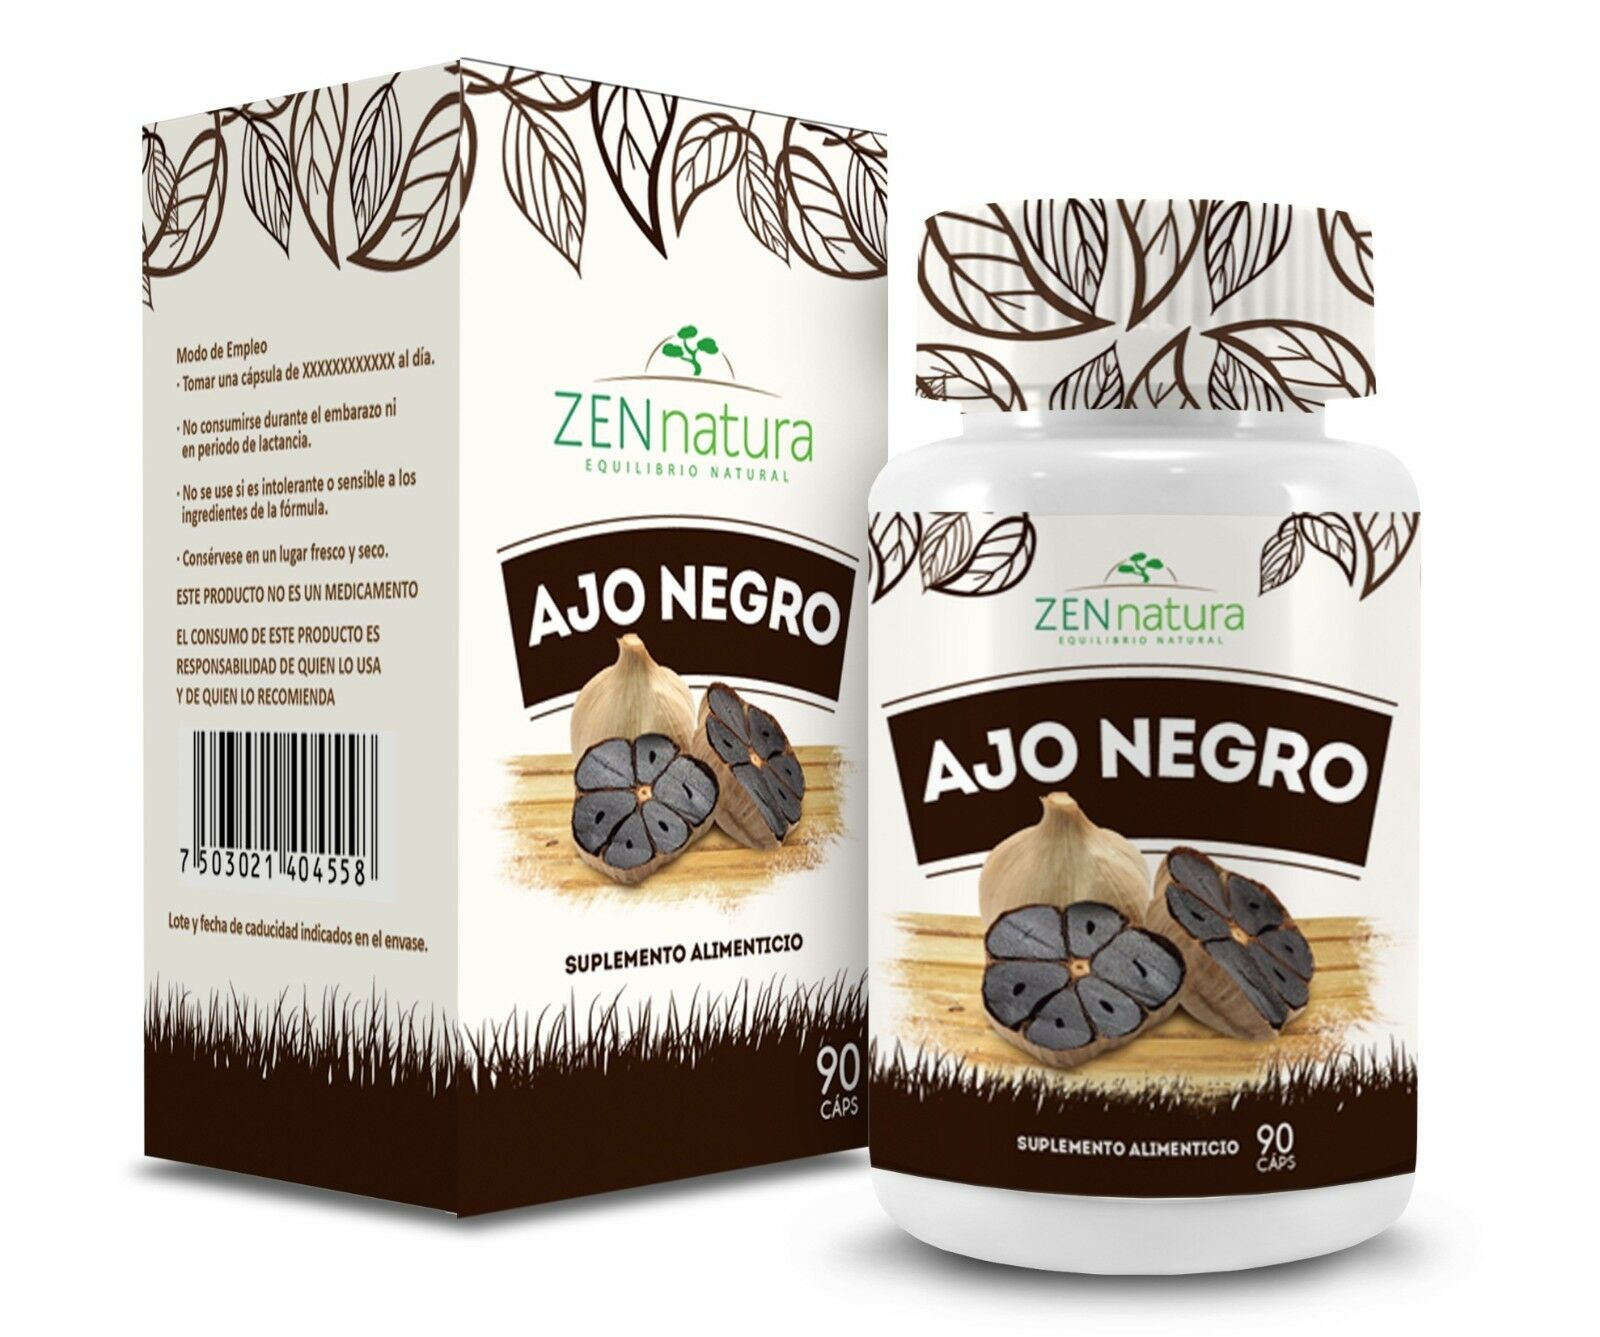 Zen Natura Ajo Negro Suplemento, Aged Black Garlic Supplement, from Mexico